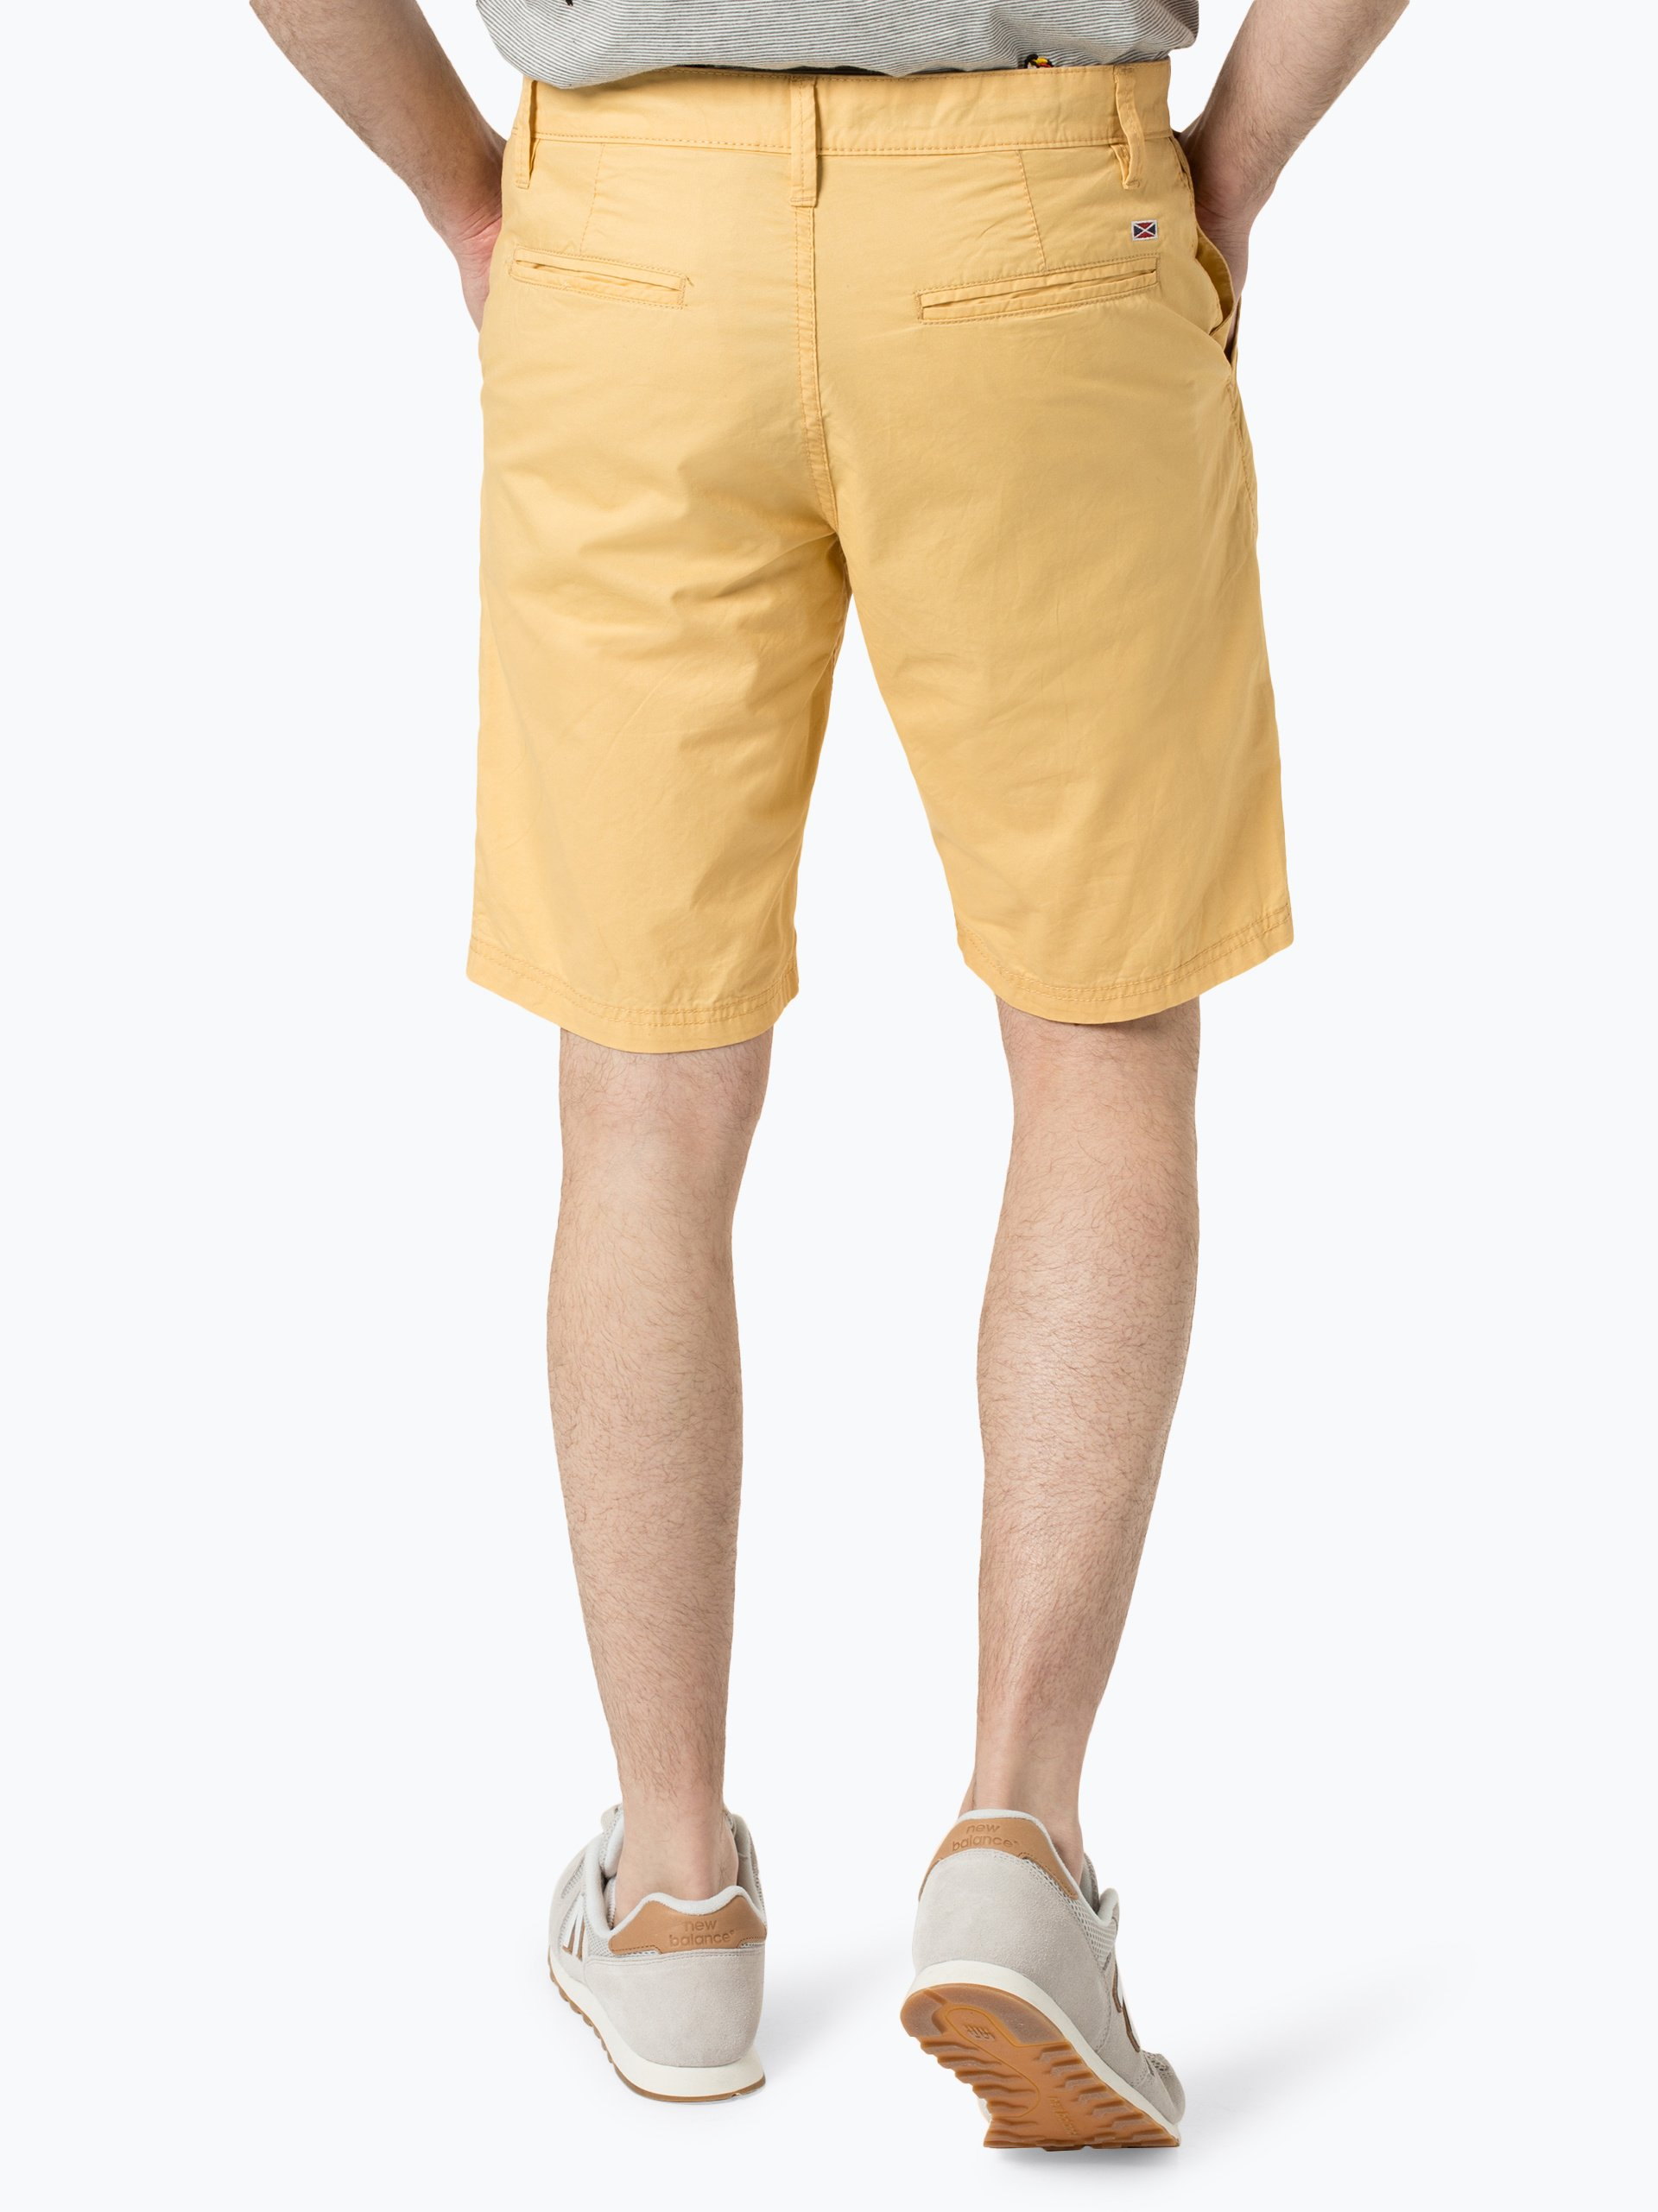 Andrew James Sailing Herren Shorts - Texas